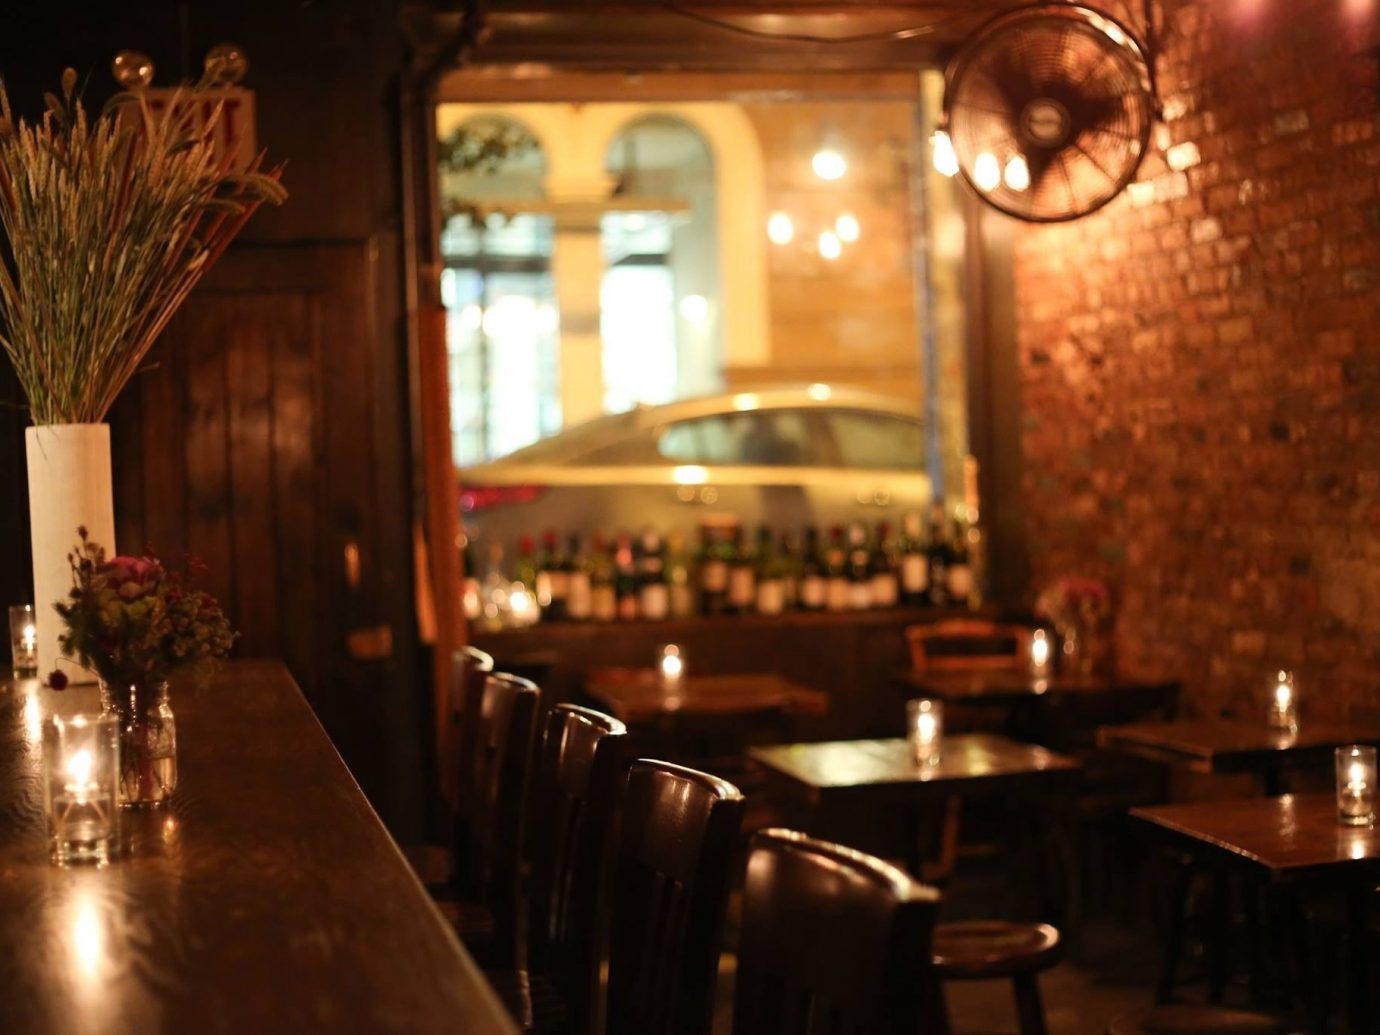 Food + Drink Romance table indoor restaurant window meal Bar lighting function hall dining room